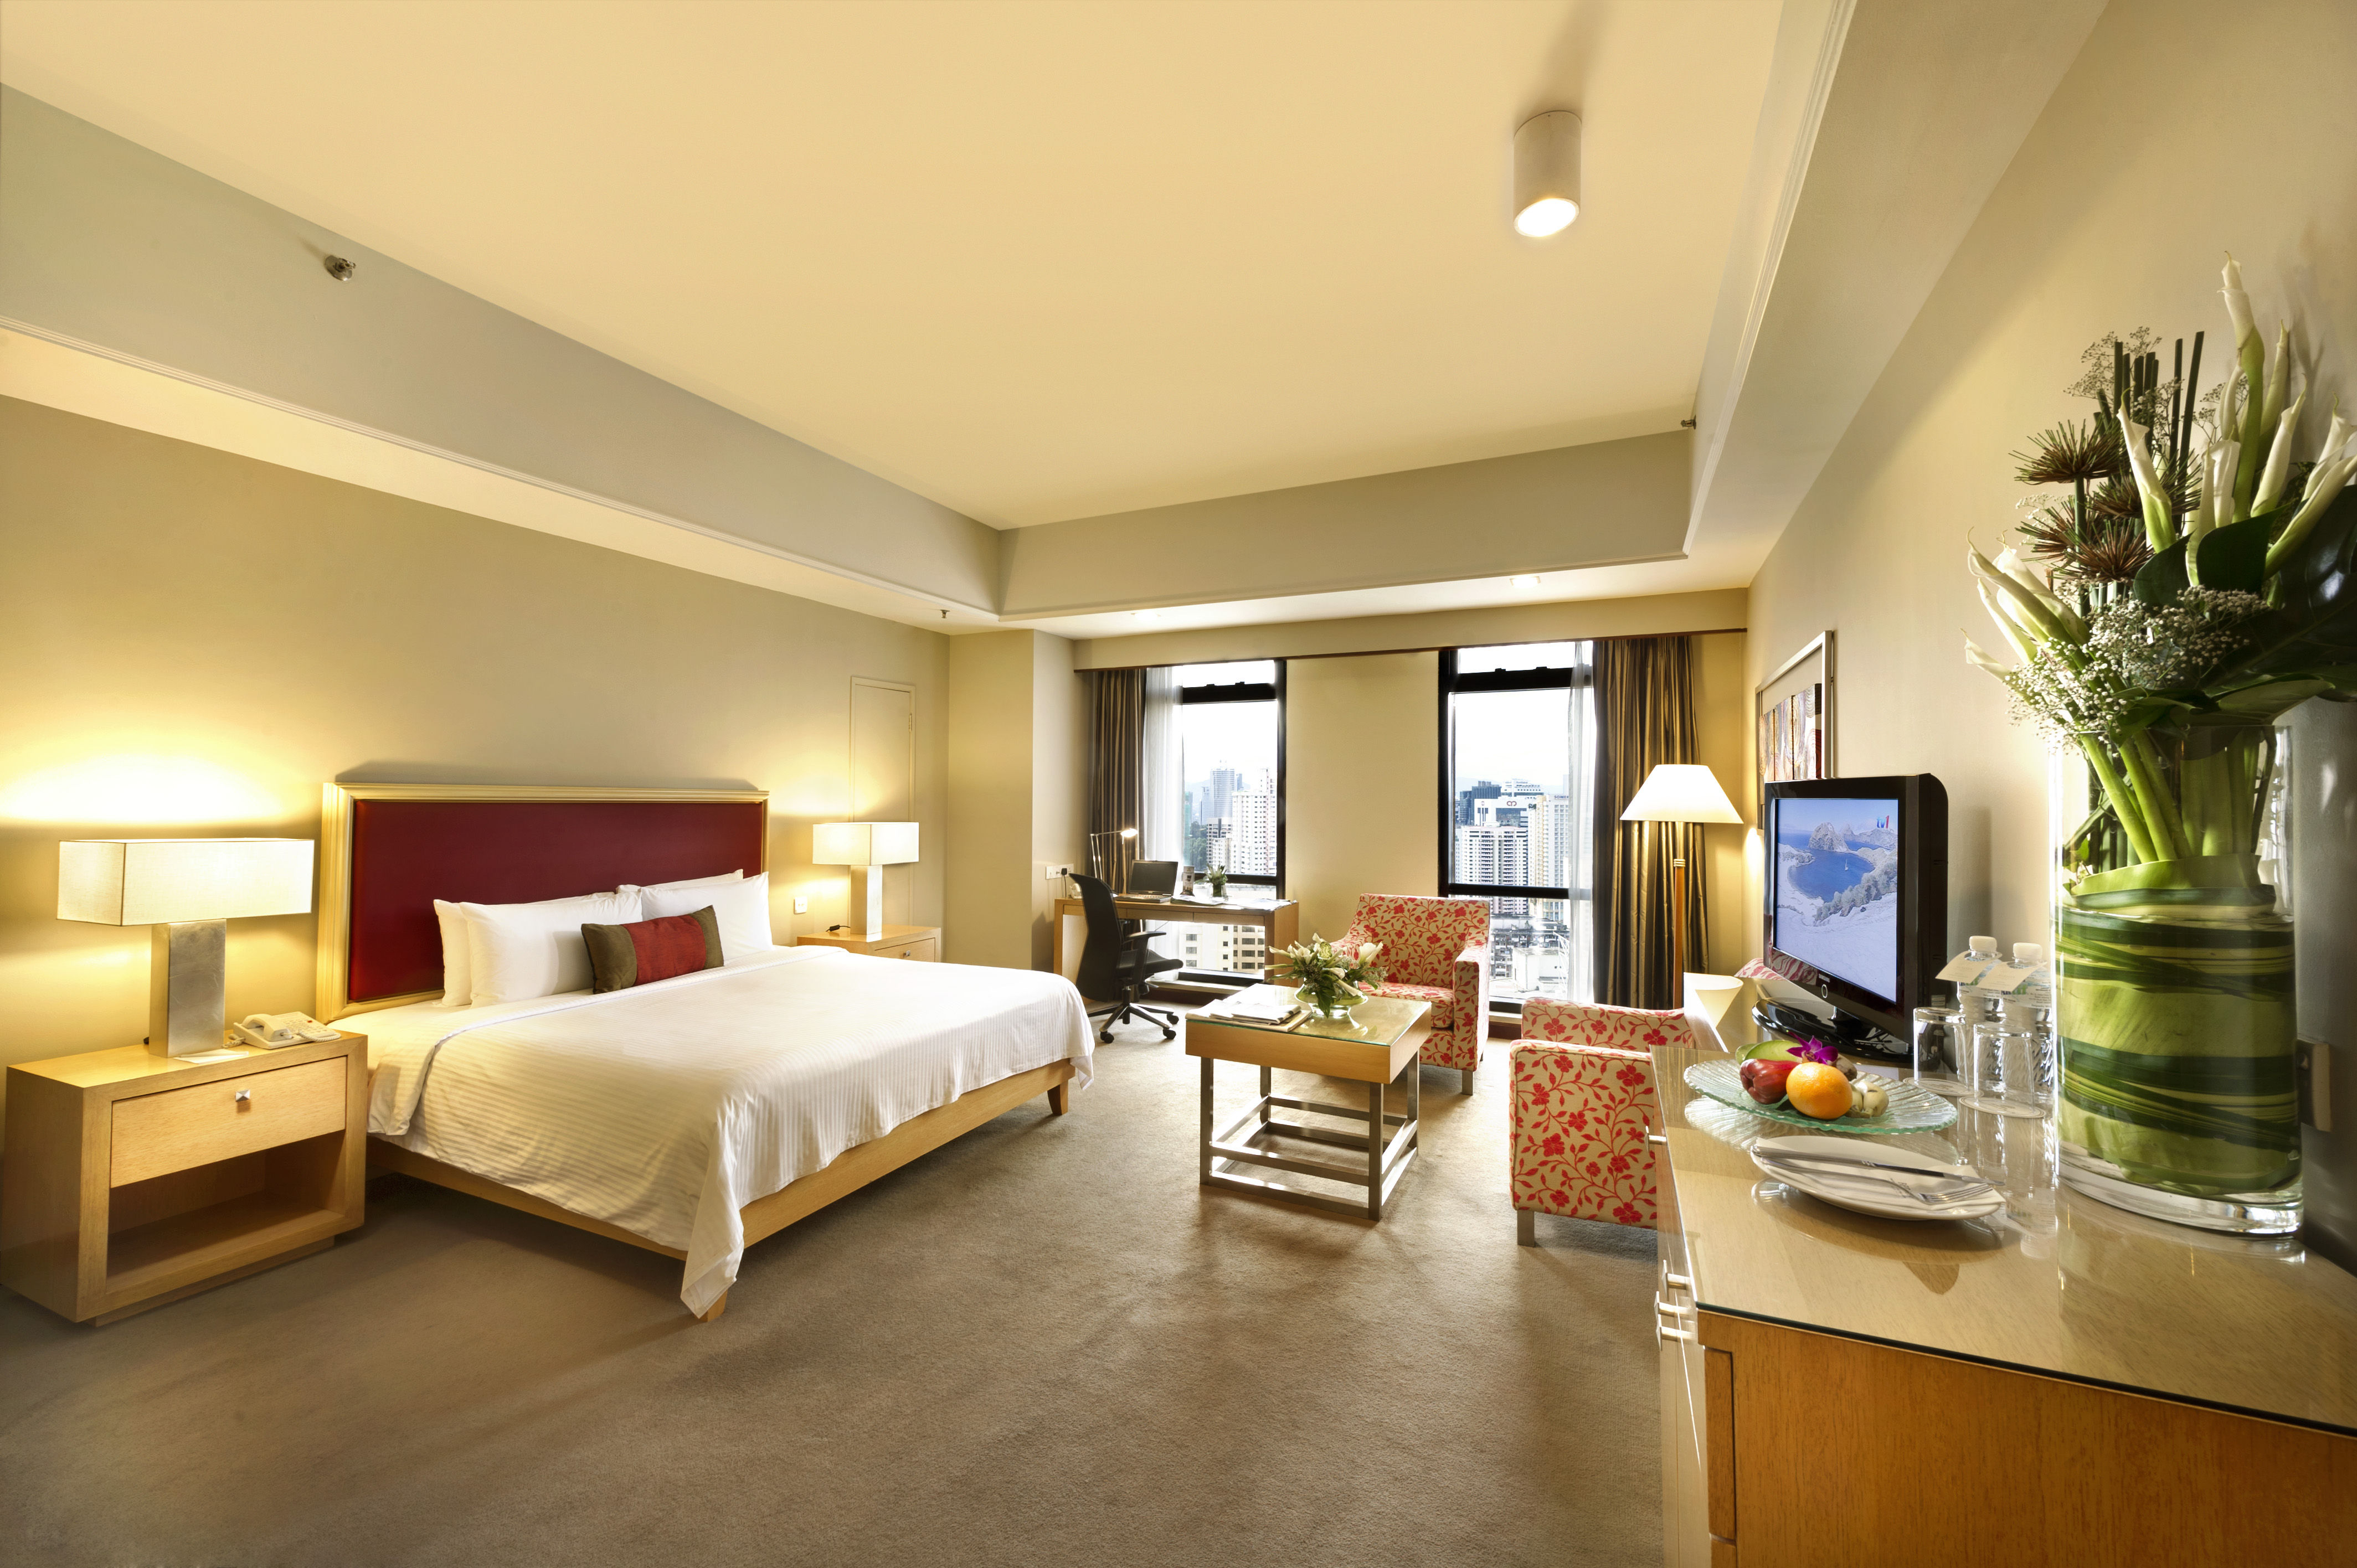 7 Days Premium Hotel Chengdu Yanshi Kou Branch Studio Apt At On Hill Village By Favstay 1 1 Page 5